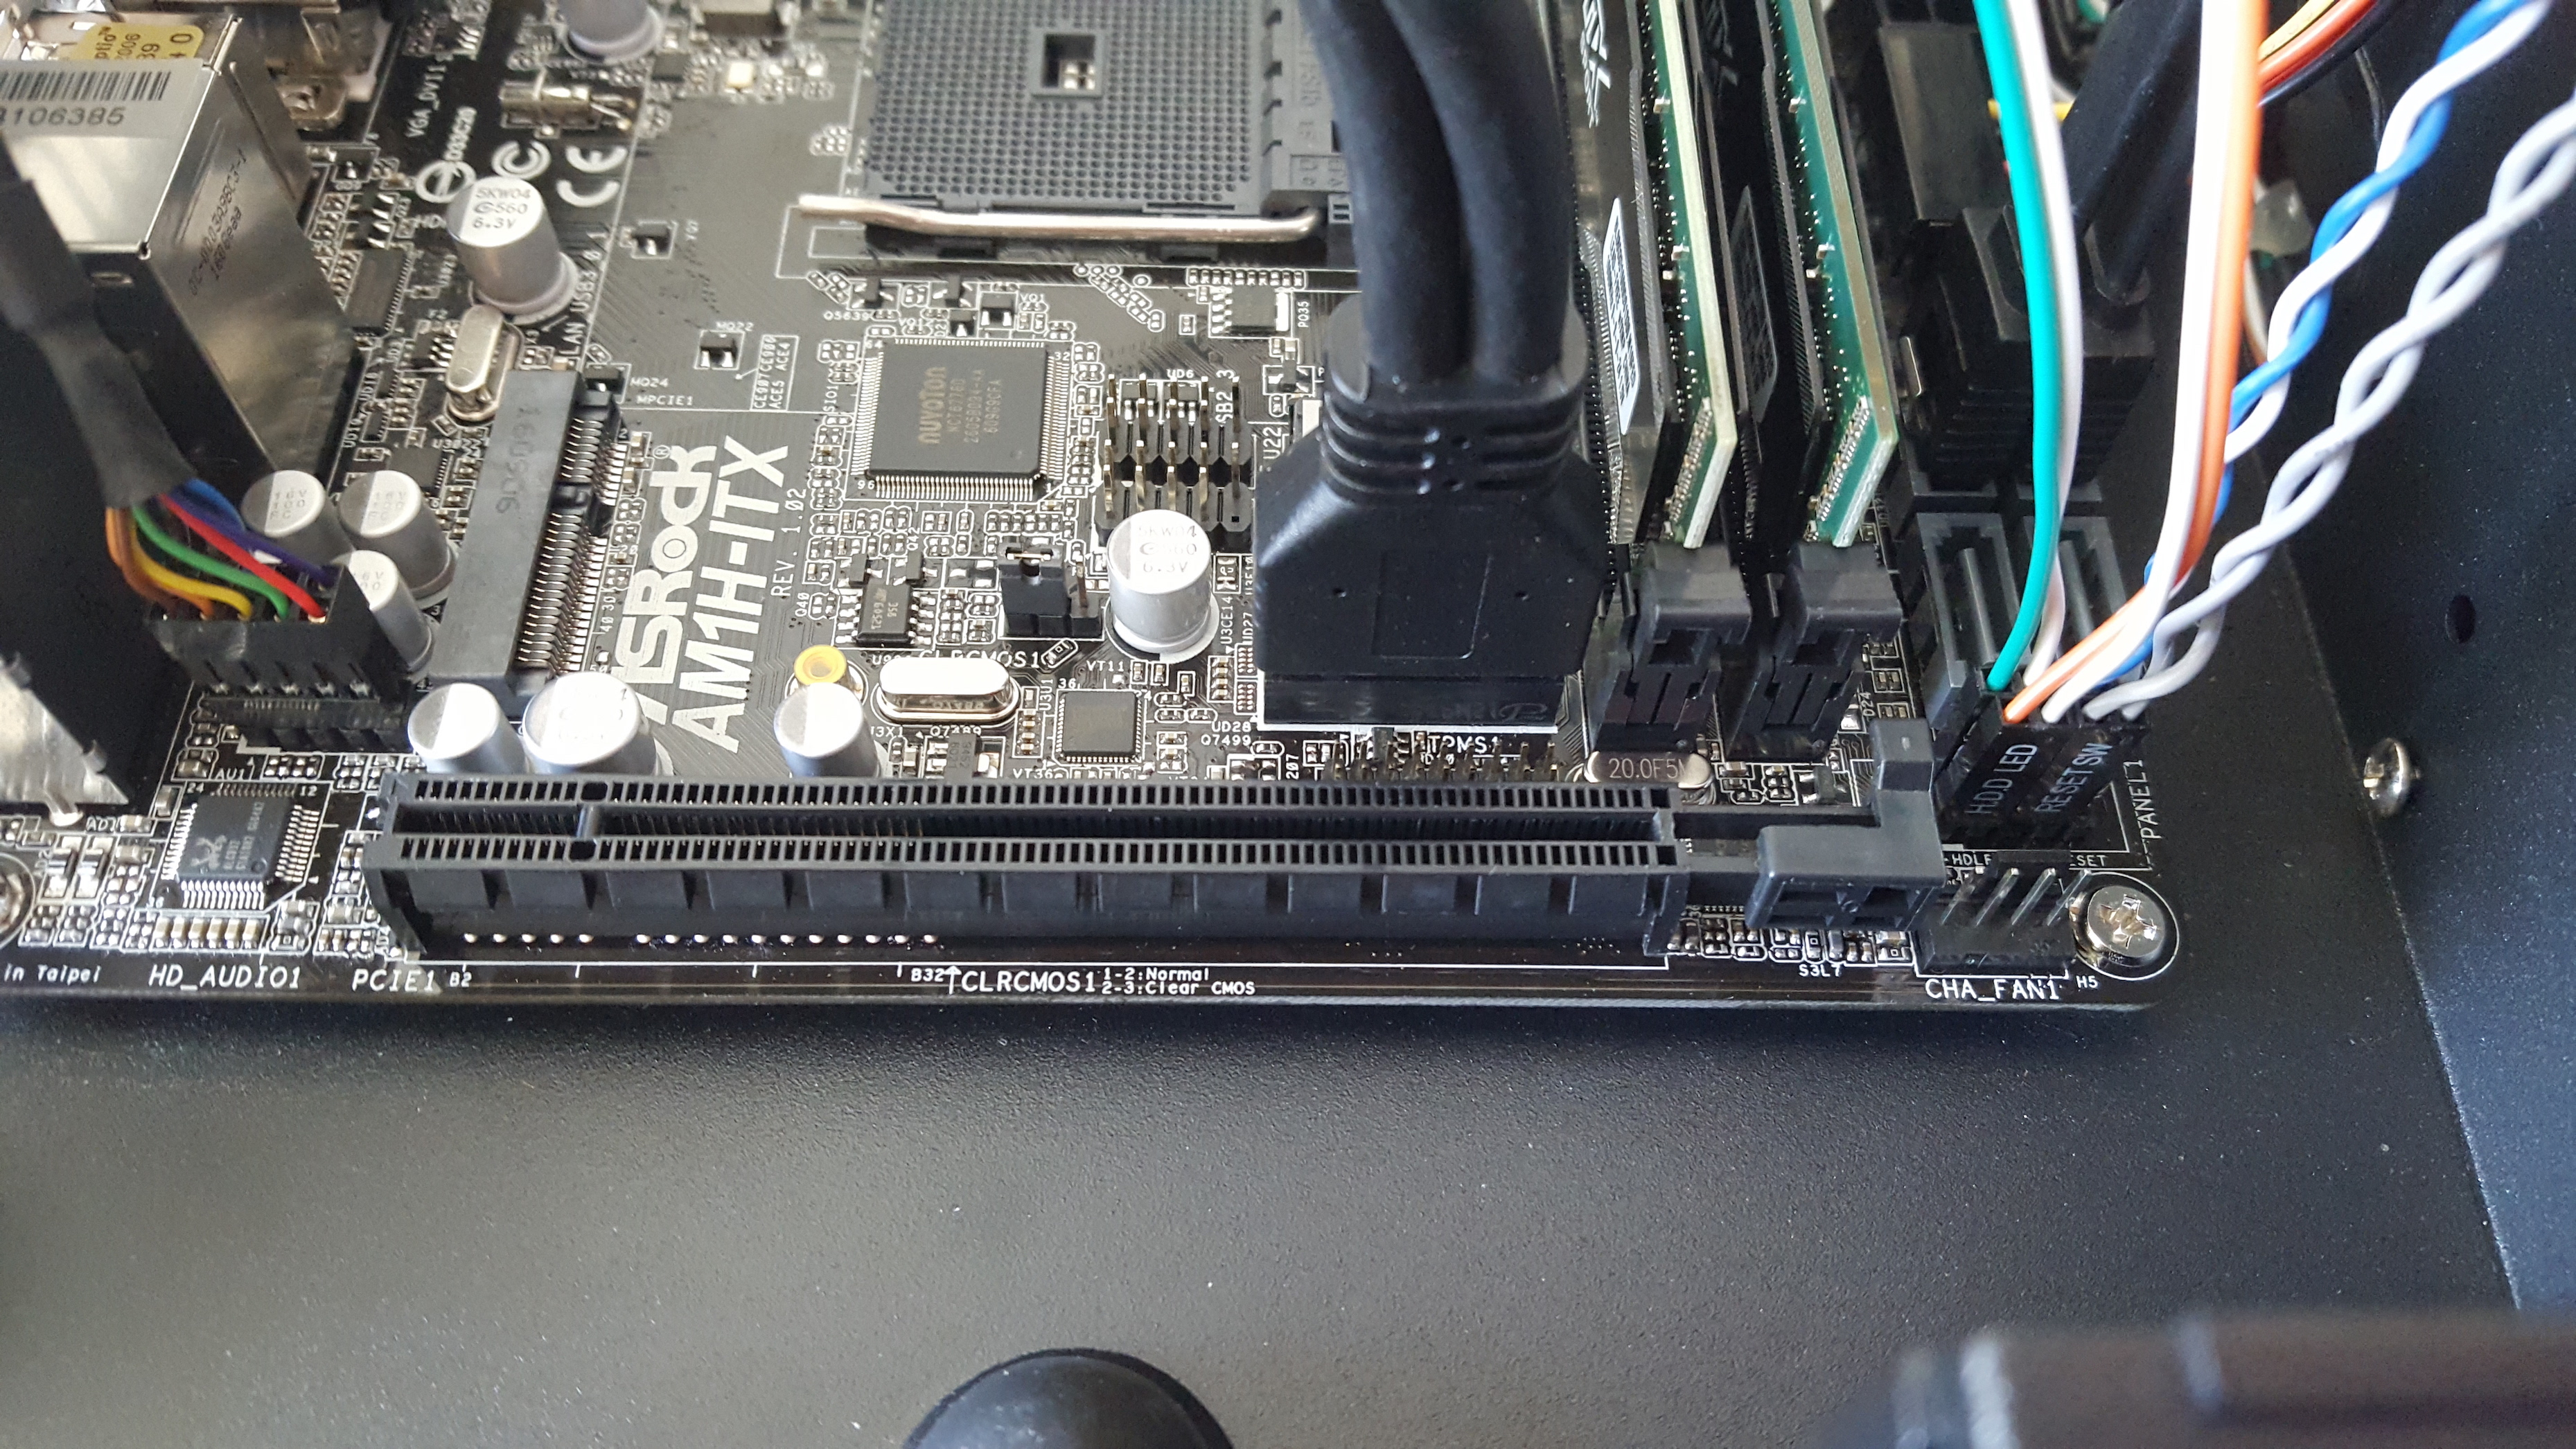 Proxmox Virtualization Server Part 1: AMD Athlon 5370 Mini